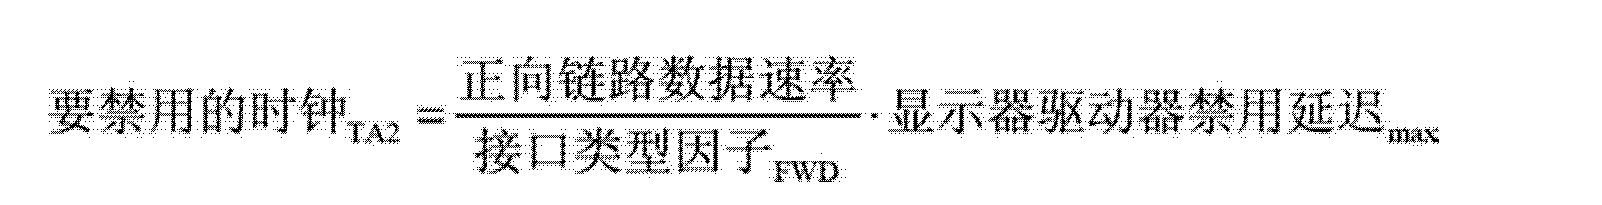 Figure CN102801595AD00833